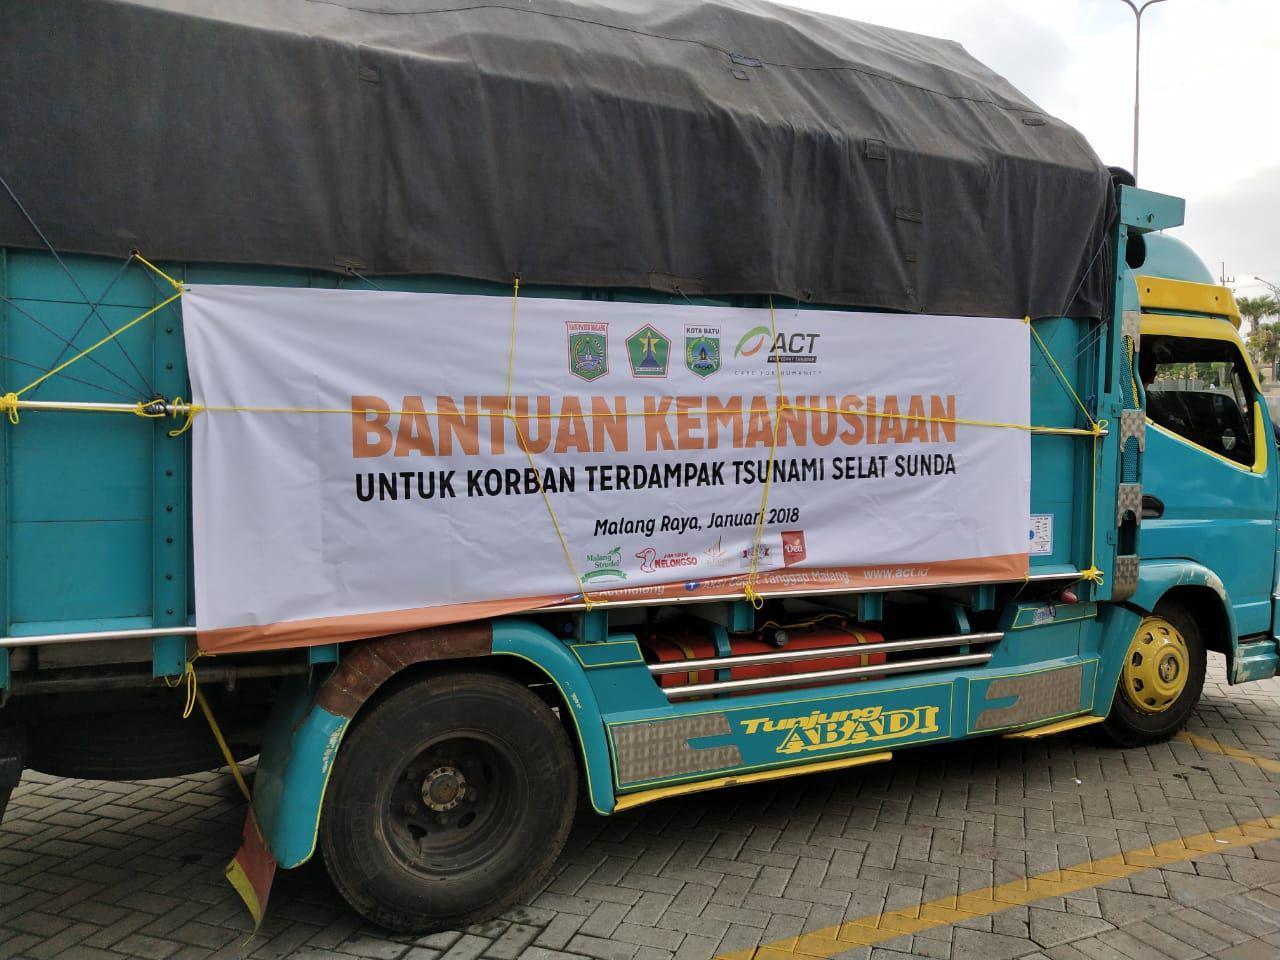 Aksi Cepat Tanggap dan Malang Strudel Kirim Bantuan untuk korban Tsunami Selat Sunda!